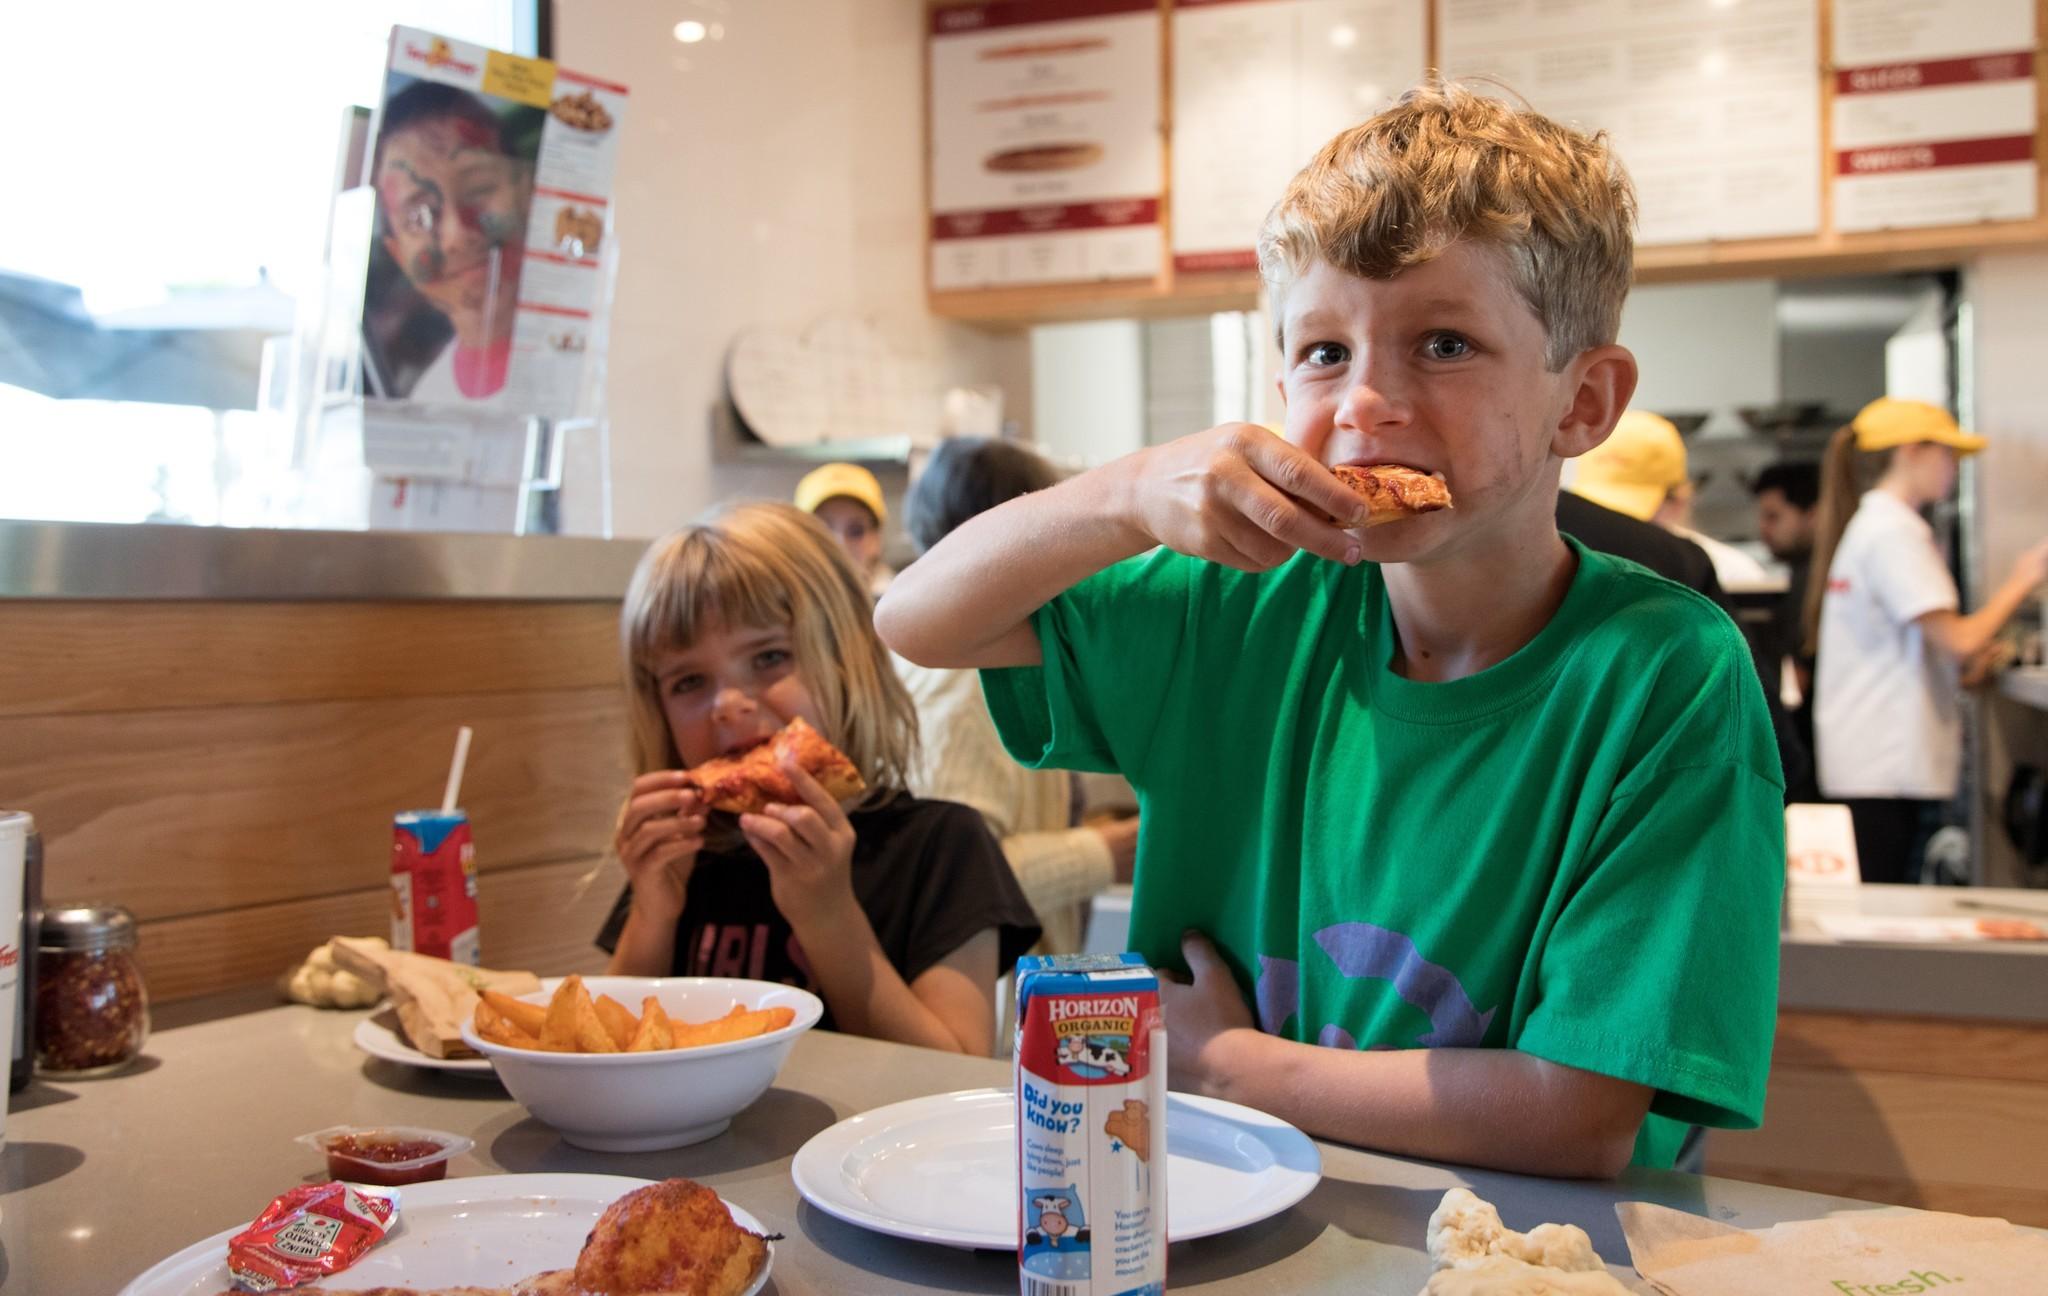 Grubbin' pizza for a good cause!